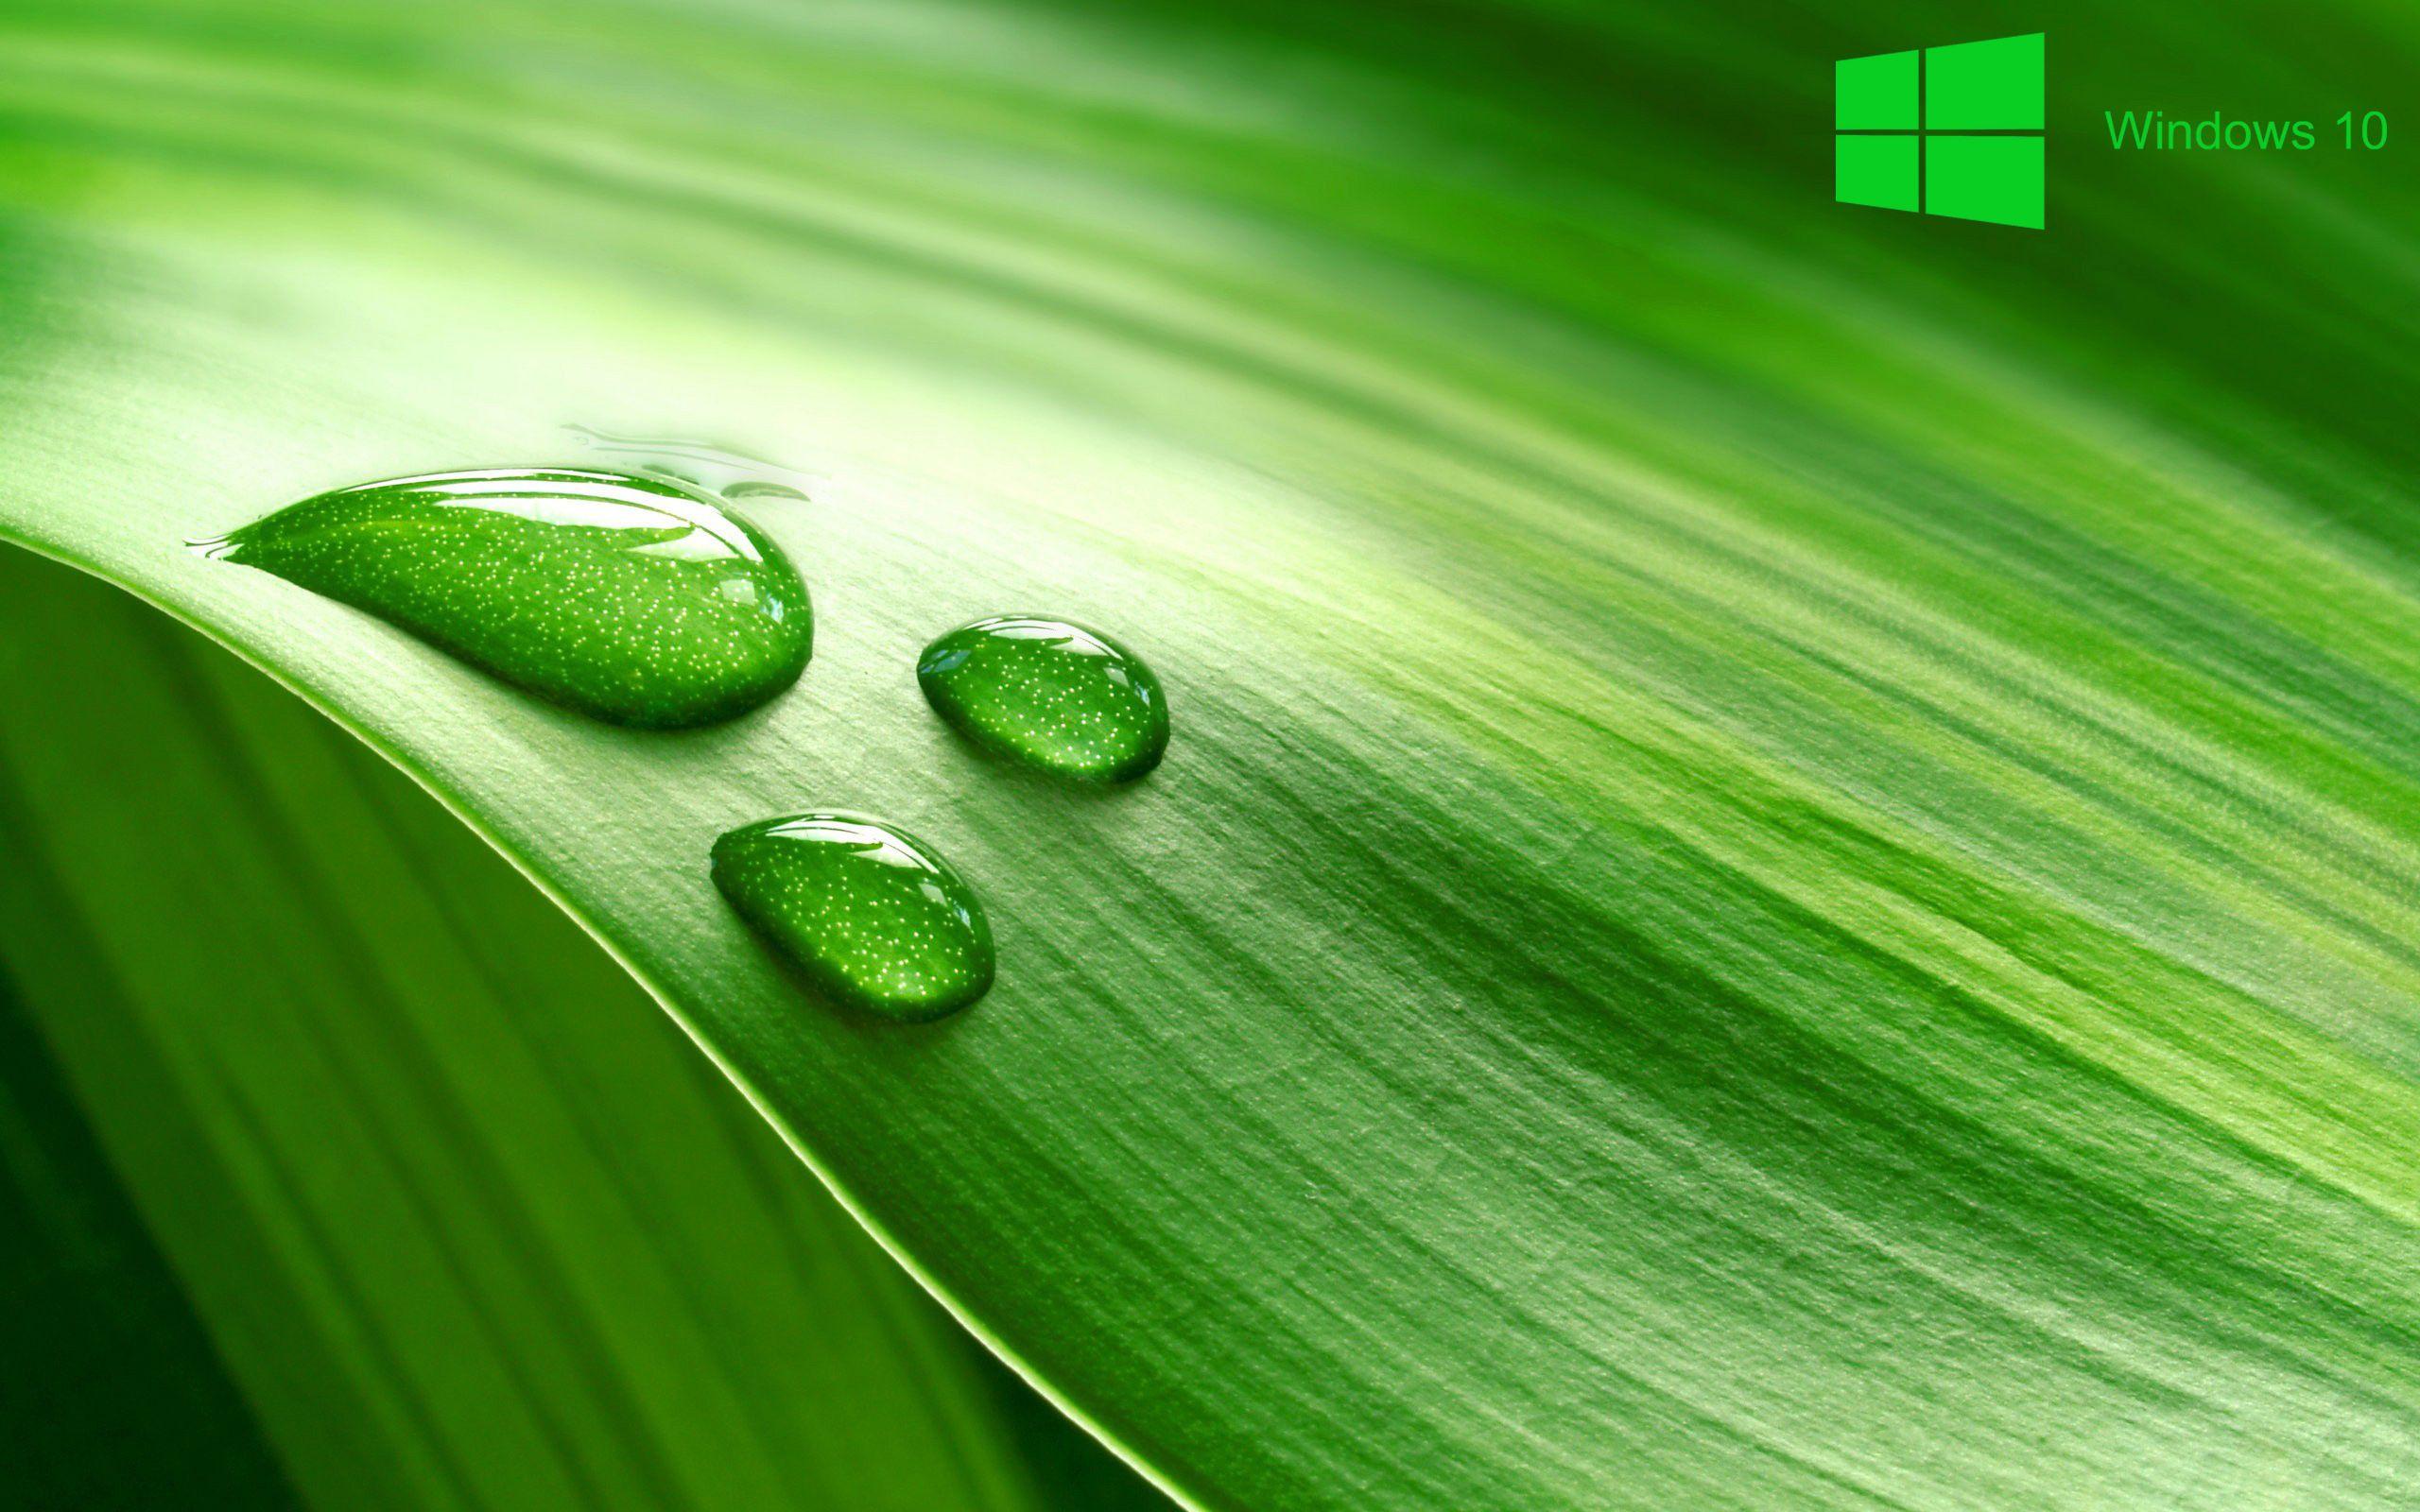 Wallpaper download for windows 10 - Download Windows 10 Desktop Backgrounds Windows 10 Wallpapers